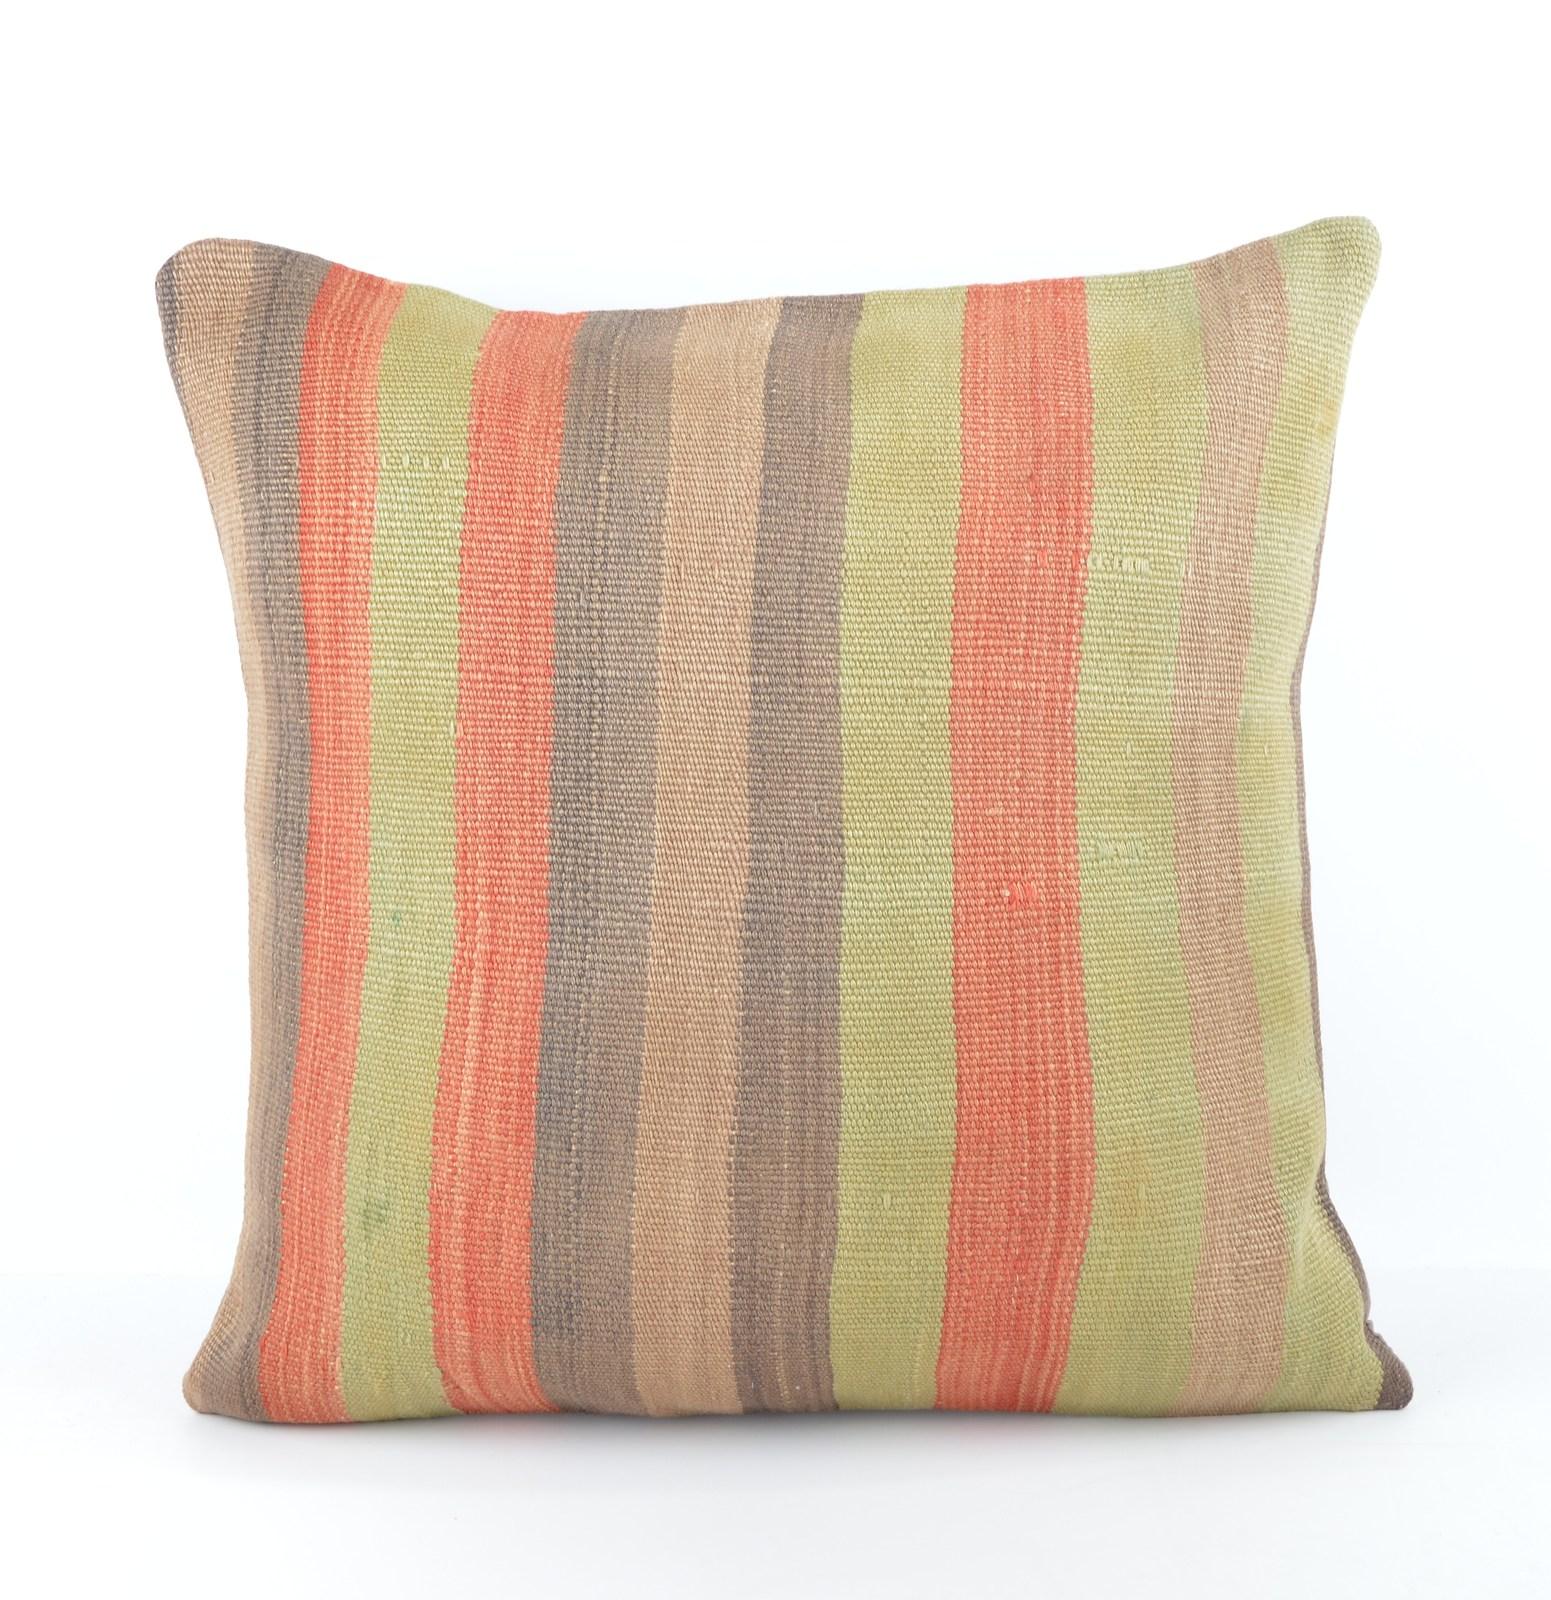 large kilim pillow 20x20 kilim cushion 50x50cm large pillow big throw pillow - Pillows